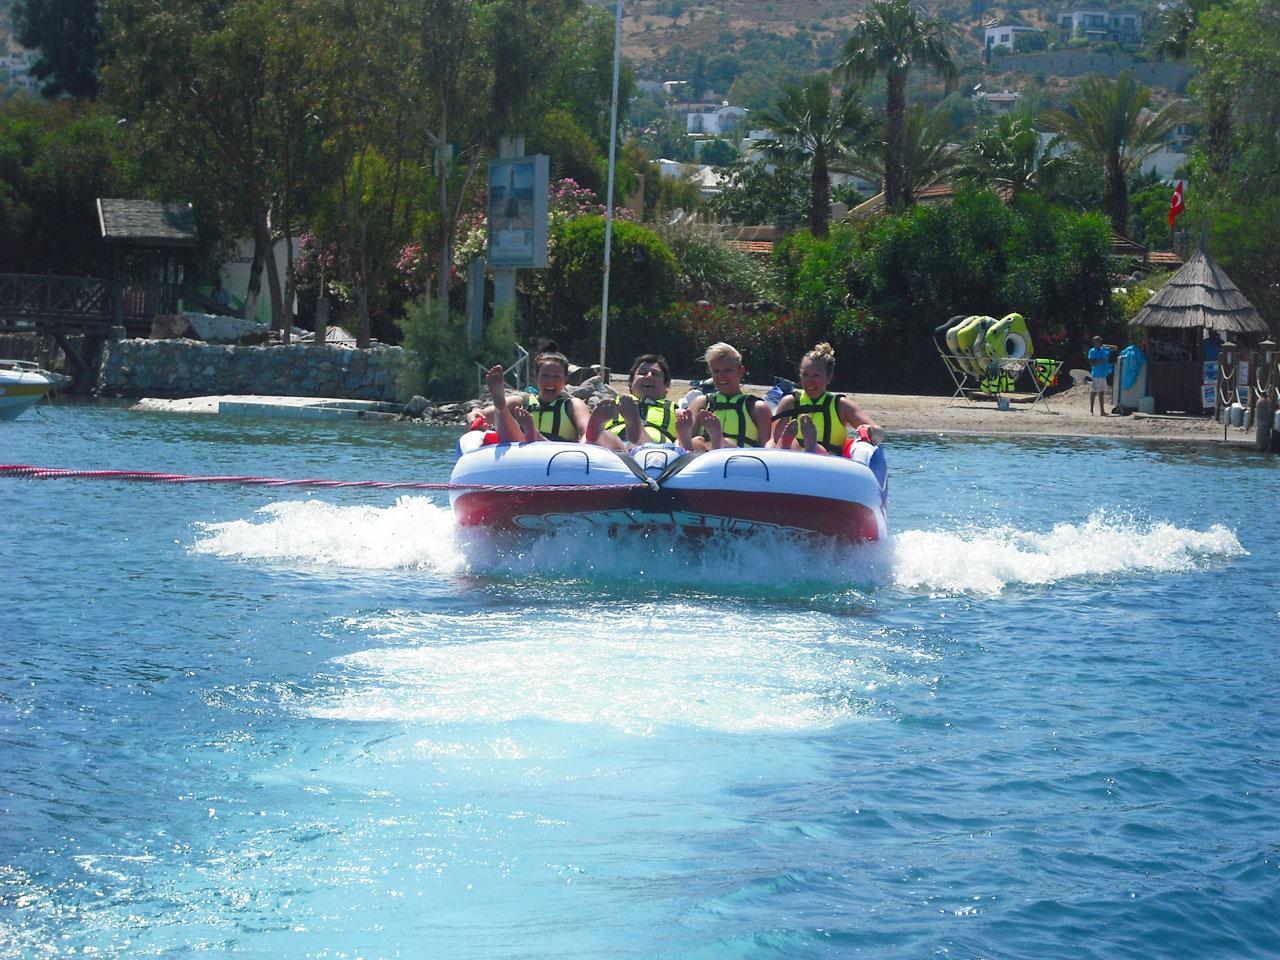 Watersports speed boat ride at Golturkbuku beach, great fun!